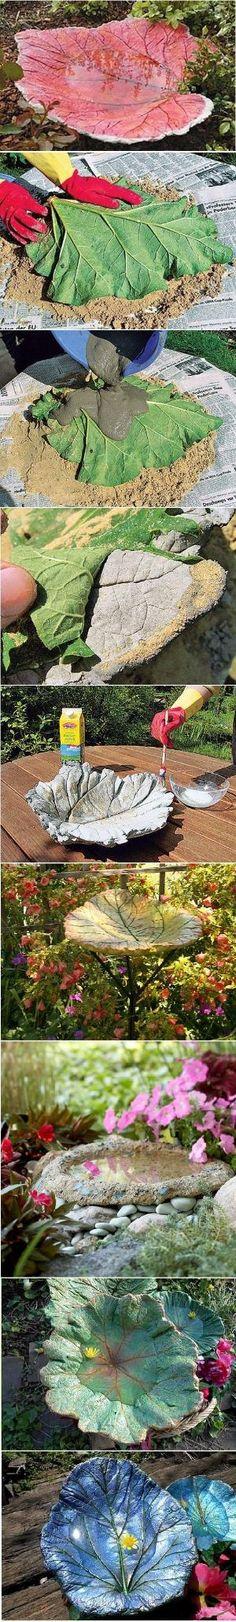 How To Make A Stand Cast Birdbath in Leaf Shape by rhonda.white.52206